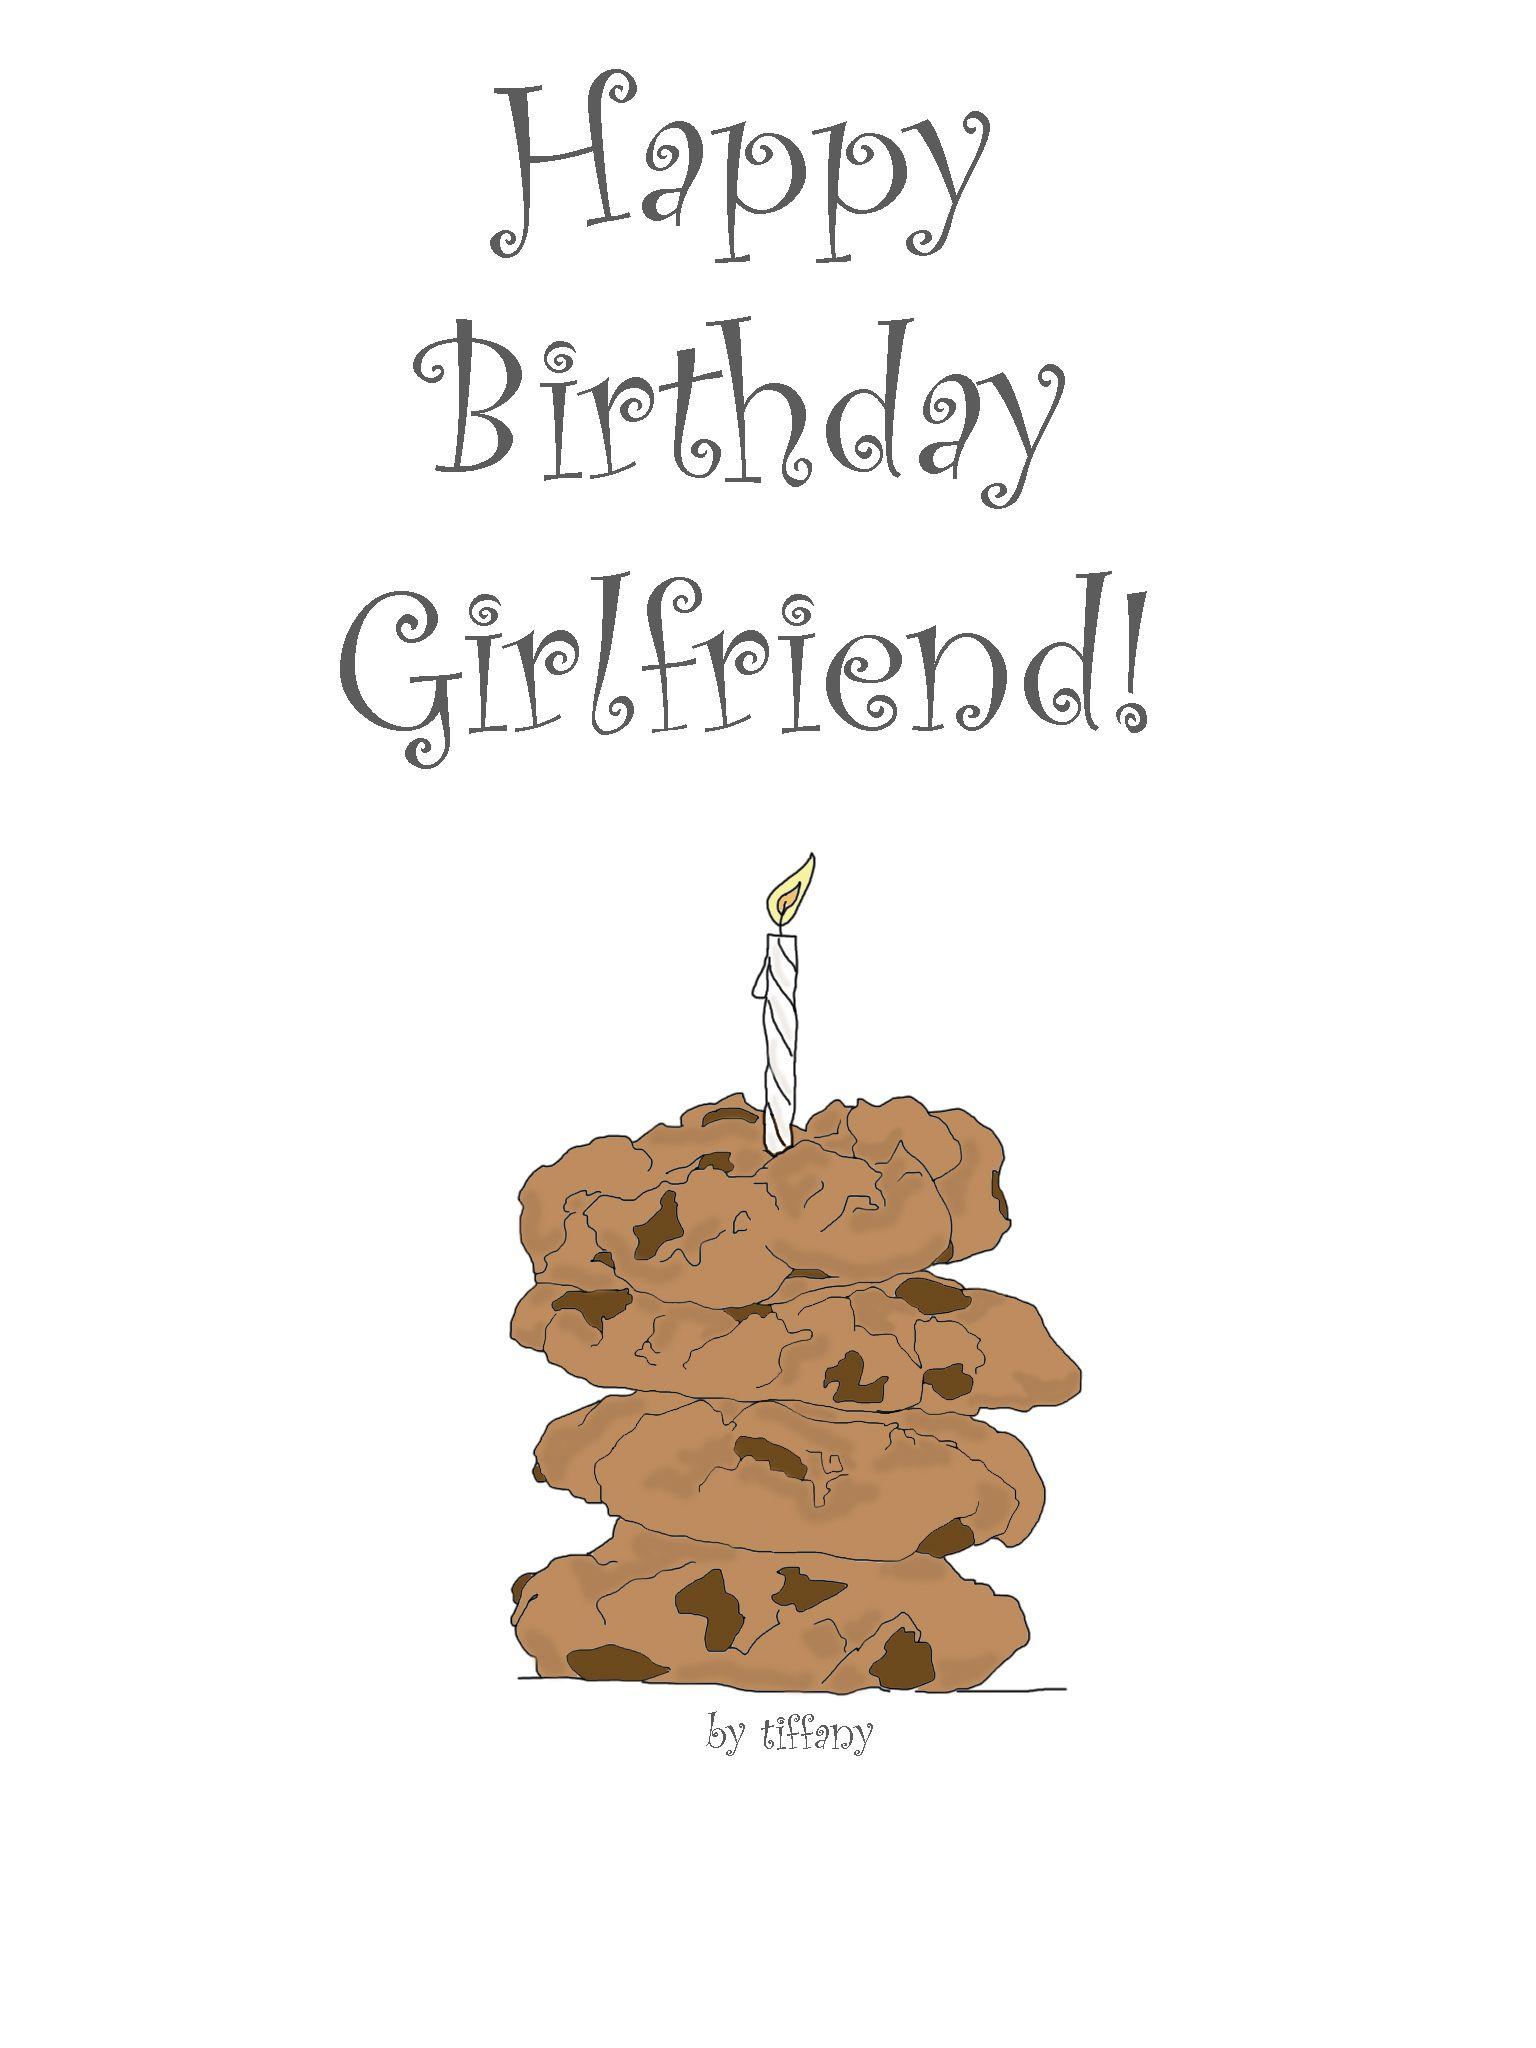 Birthday card for my best friend georgia happy birthday pisces birthday card for my best friend georgia happy birthday pisces kristyandbryce Images